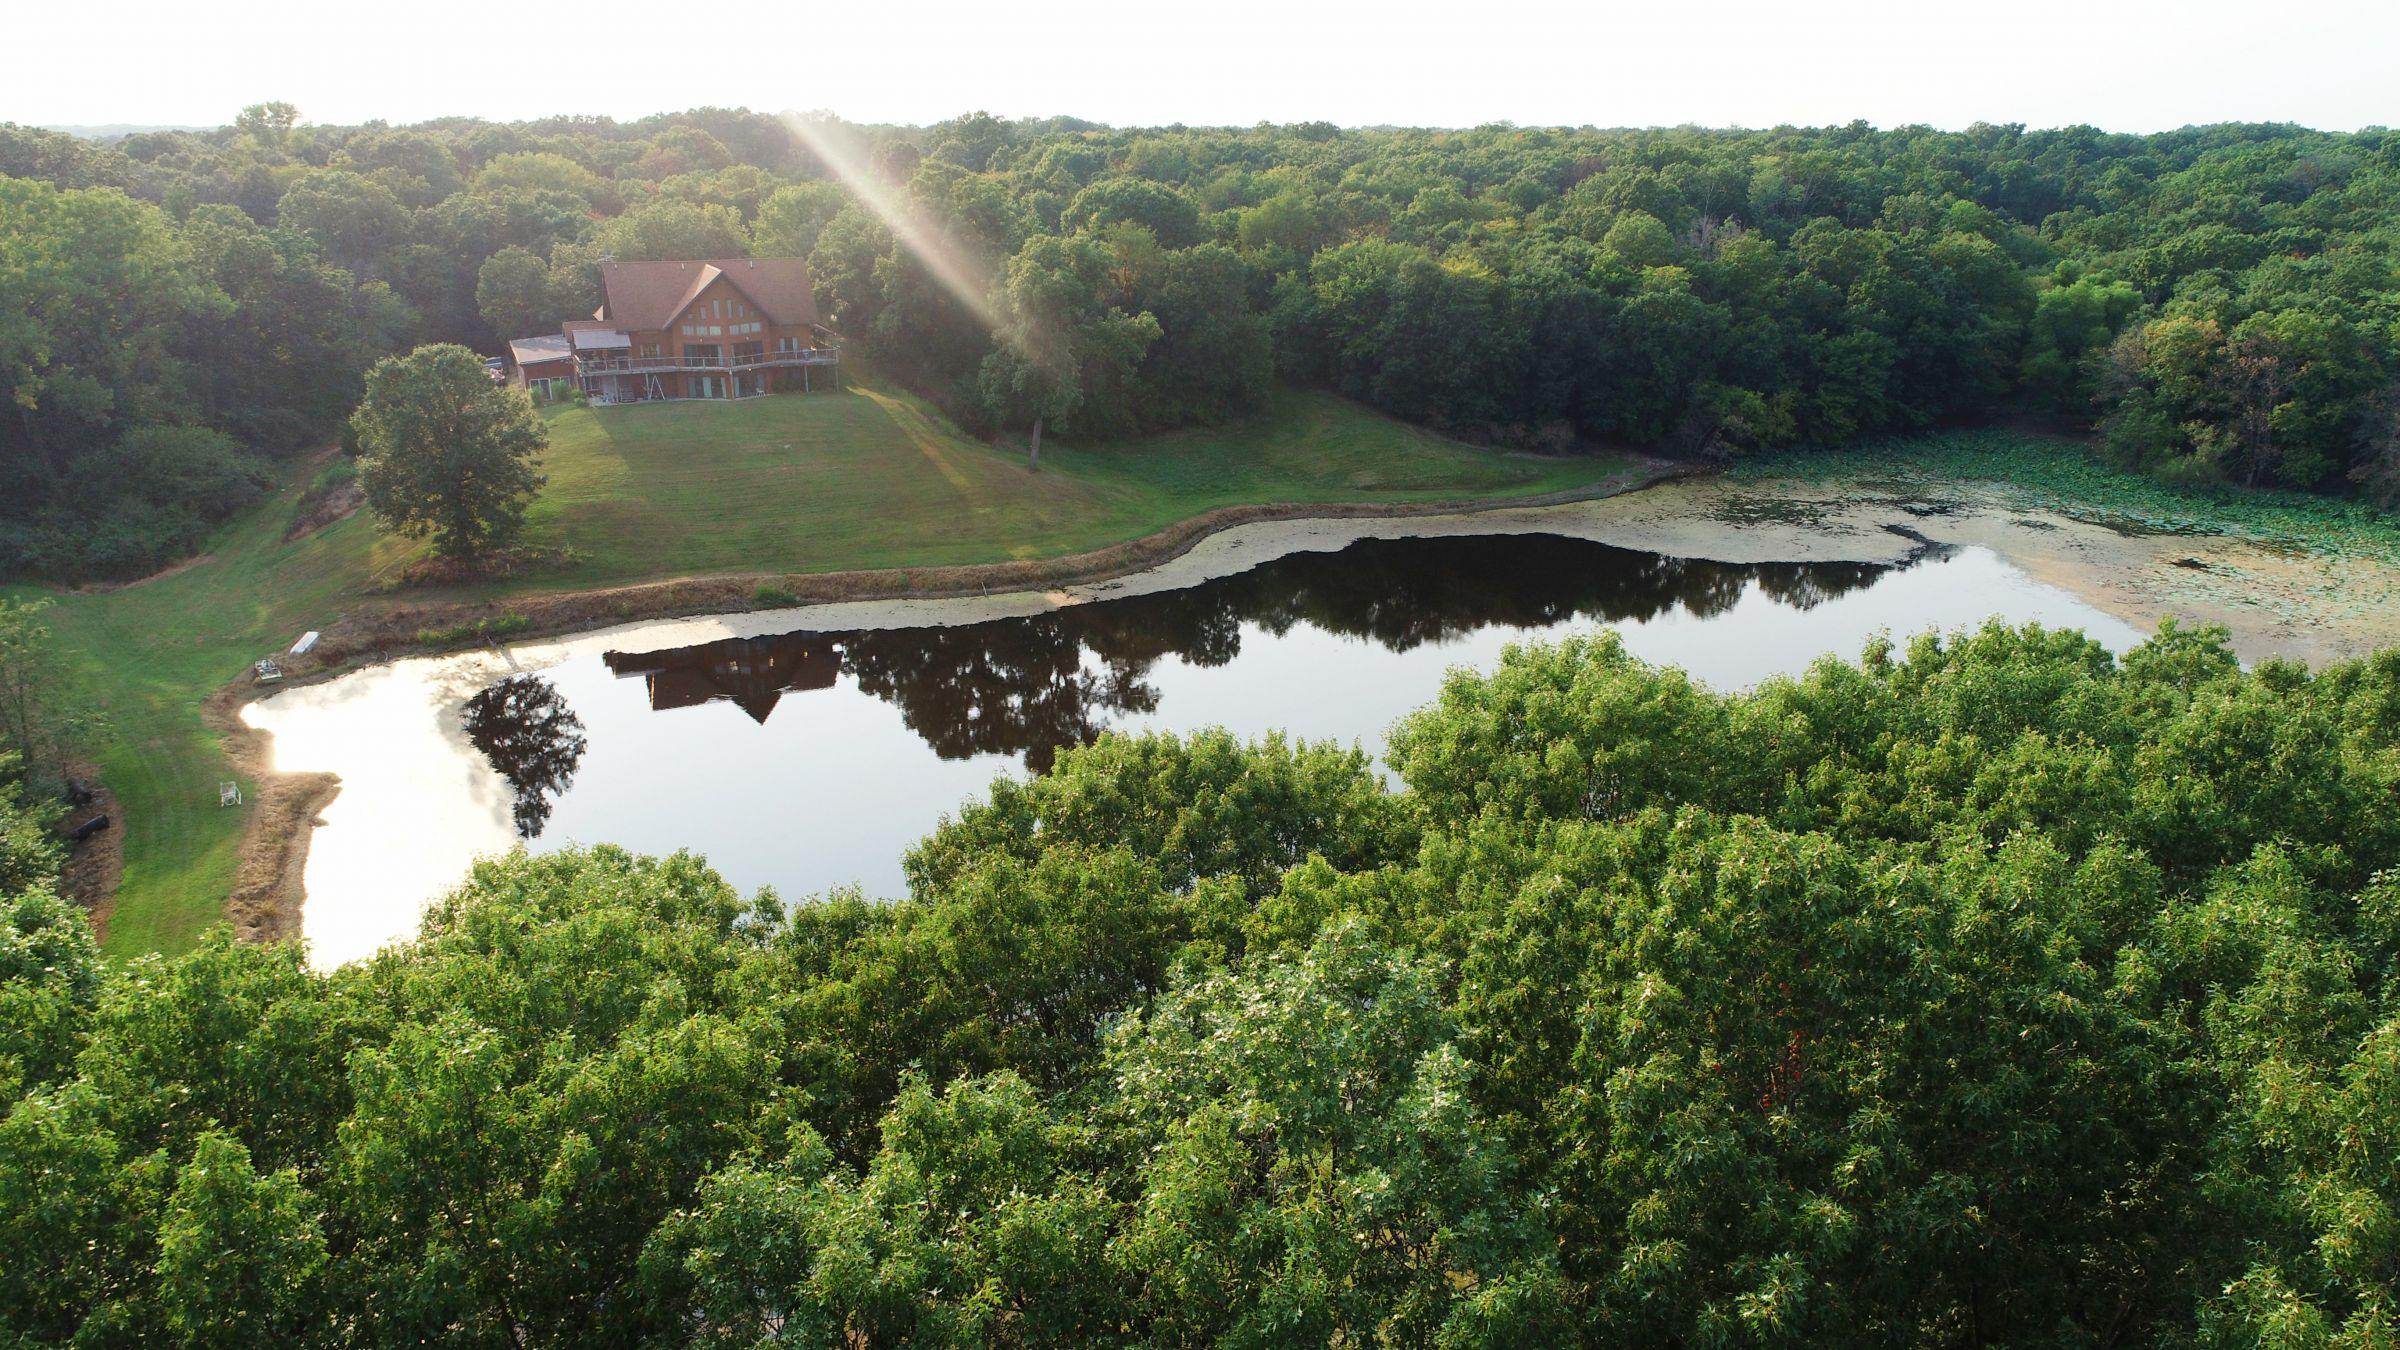 land-lee-county-iowa-328-acres-listing-number-15137-9-2020-08-27-174904.jpg